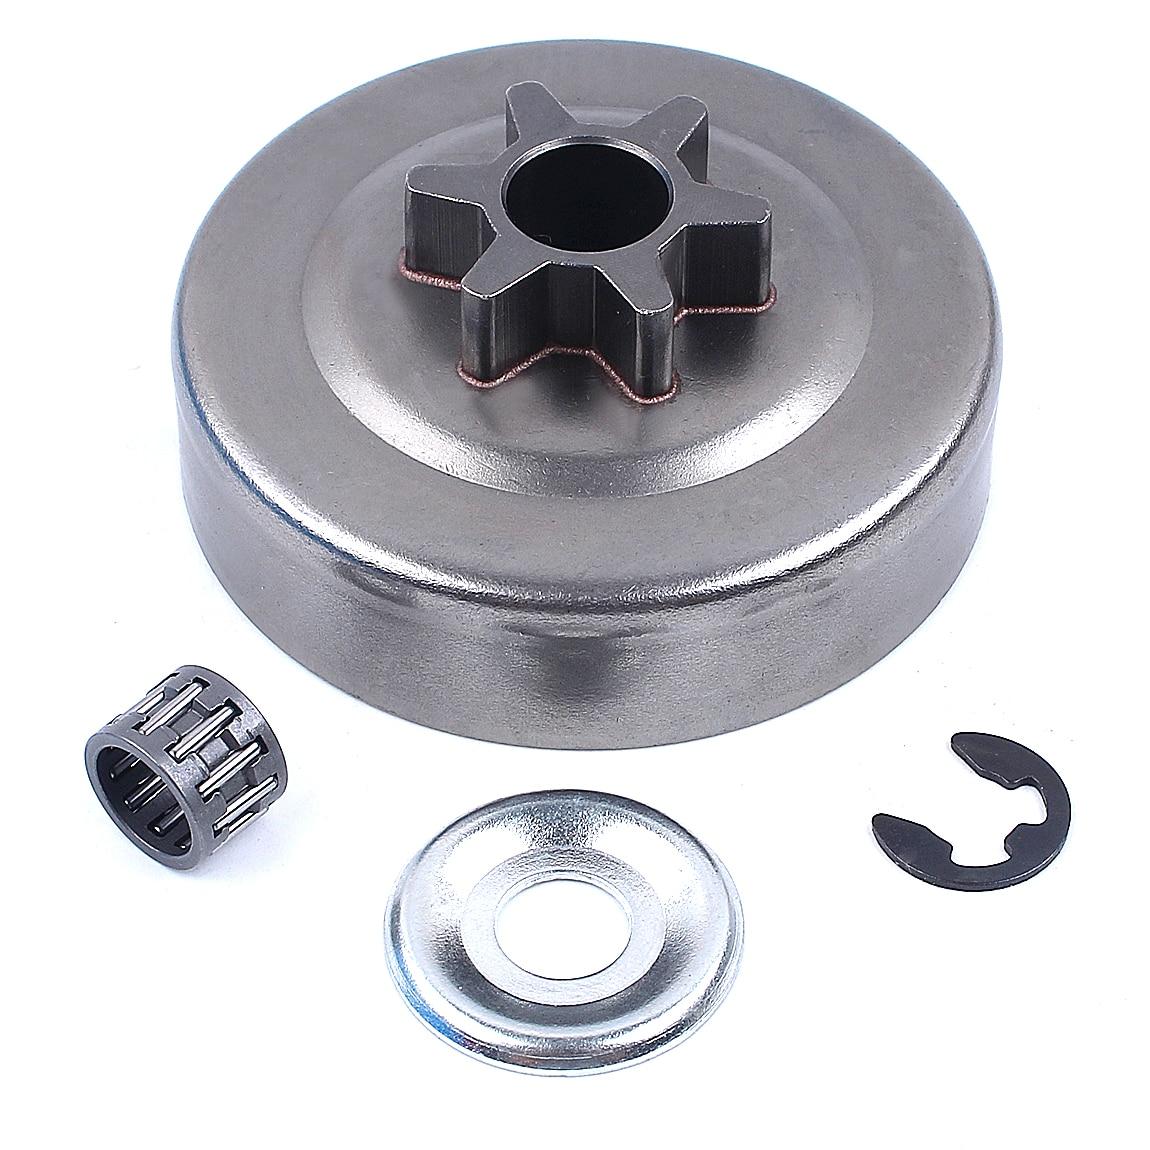 3/8 Шаг 6 т диск сцепления Звездочка шайба E-Clip комплект для STIHL 017 018 021 023 025 MS170 MS180 MS210 MS230 MS250 бензопила